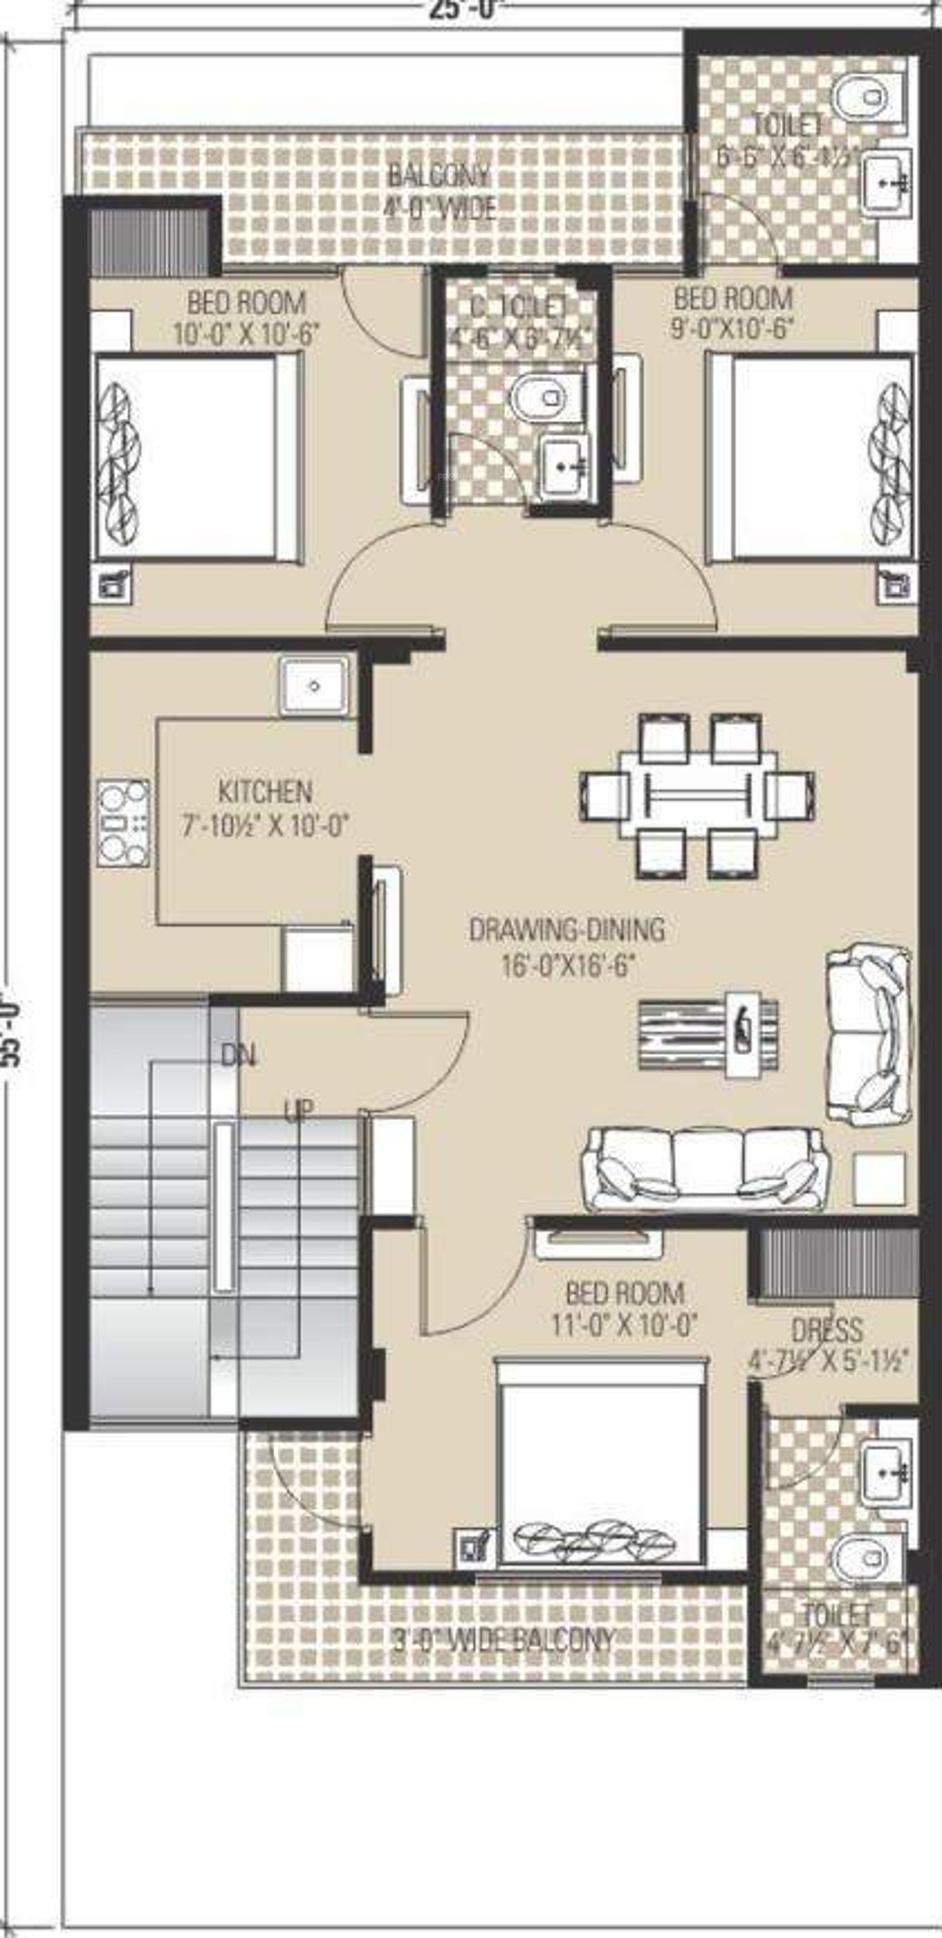 Anukriti the empyrean apartments in bhankrota jaipur for 12th floor apartments odessa